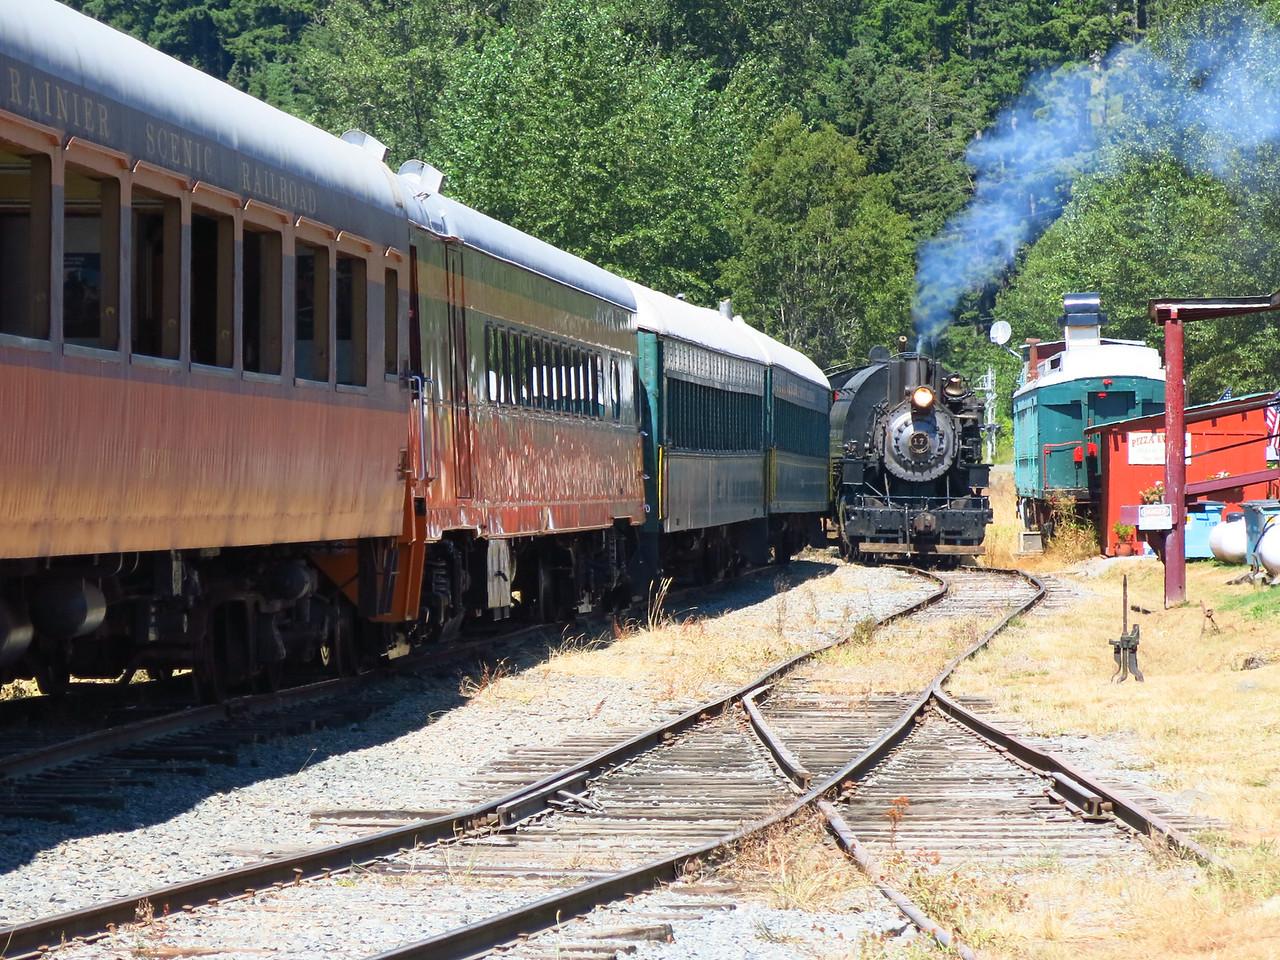 Train and #17 on the run around track